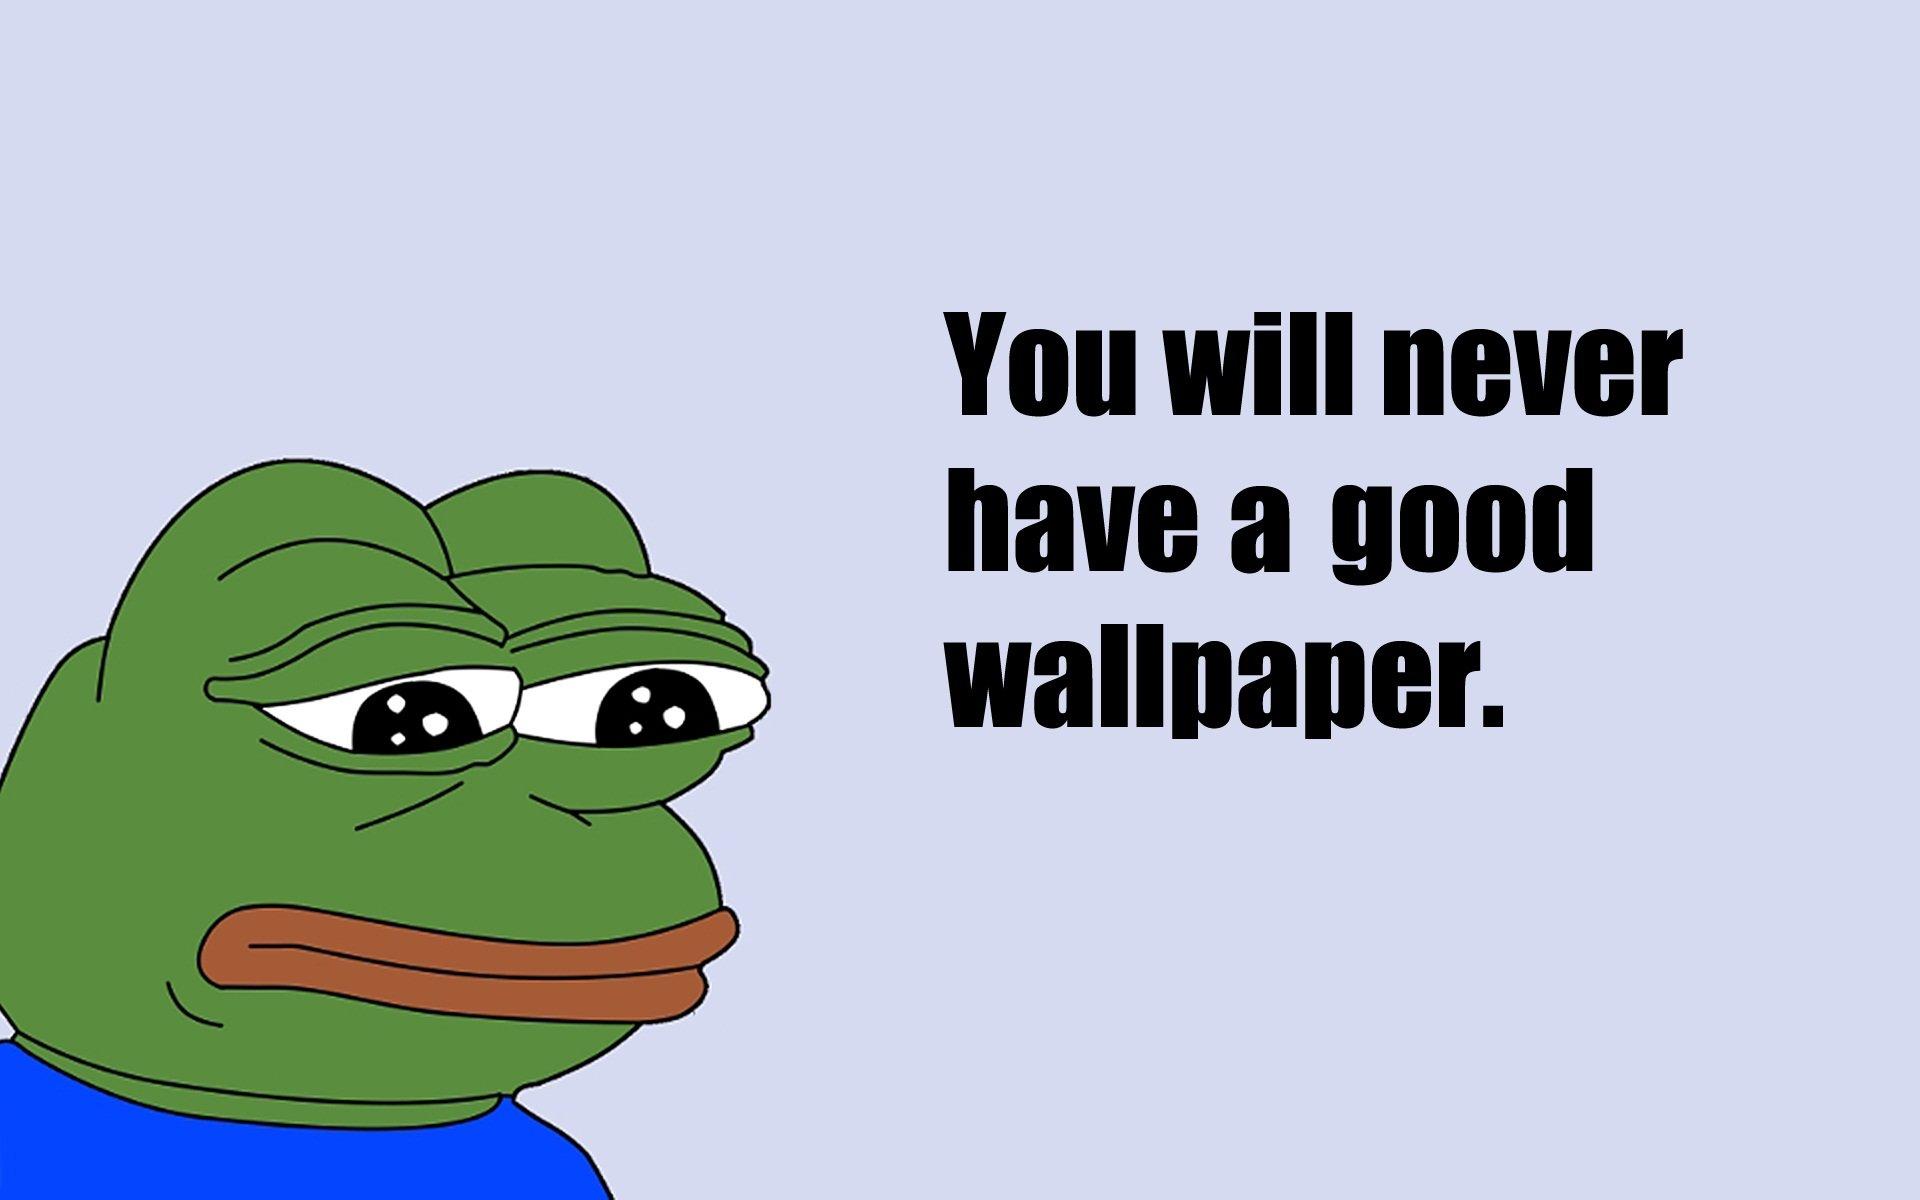 Good Wallpaper WALLPAPERCHANNEL